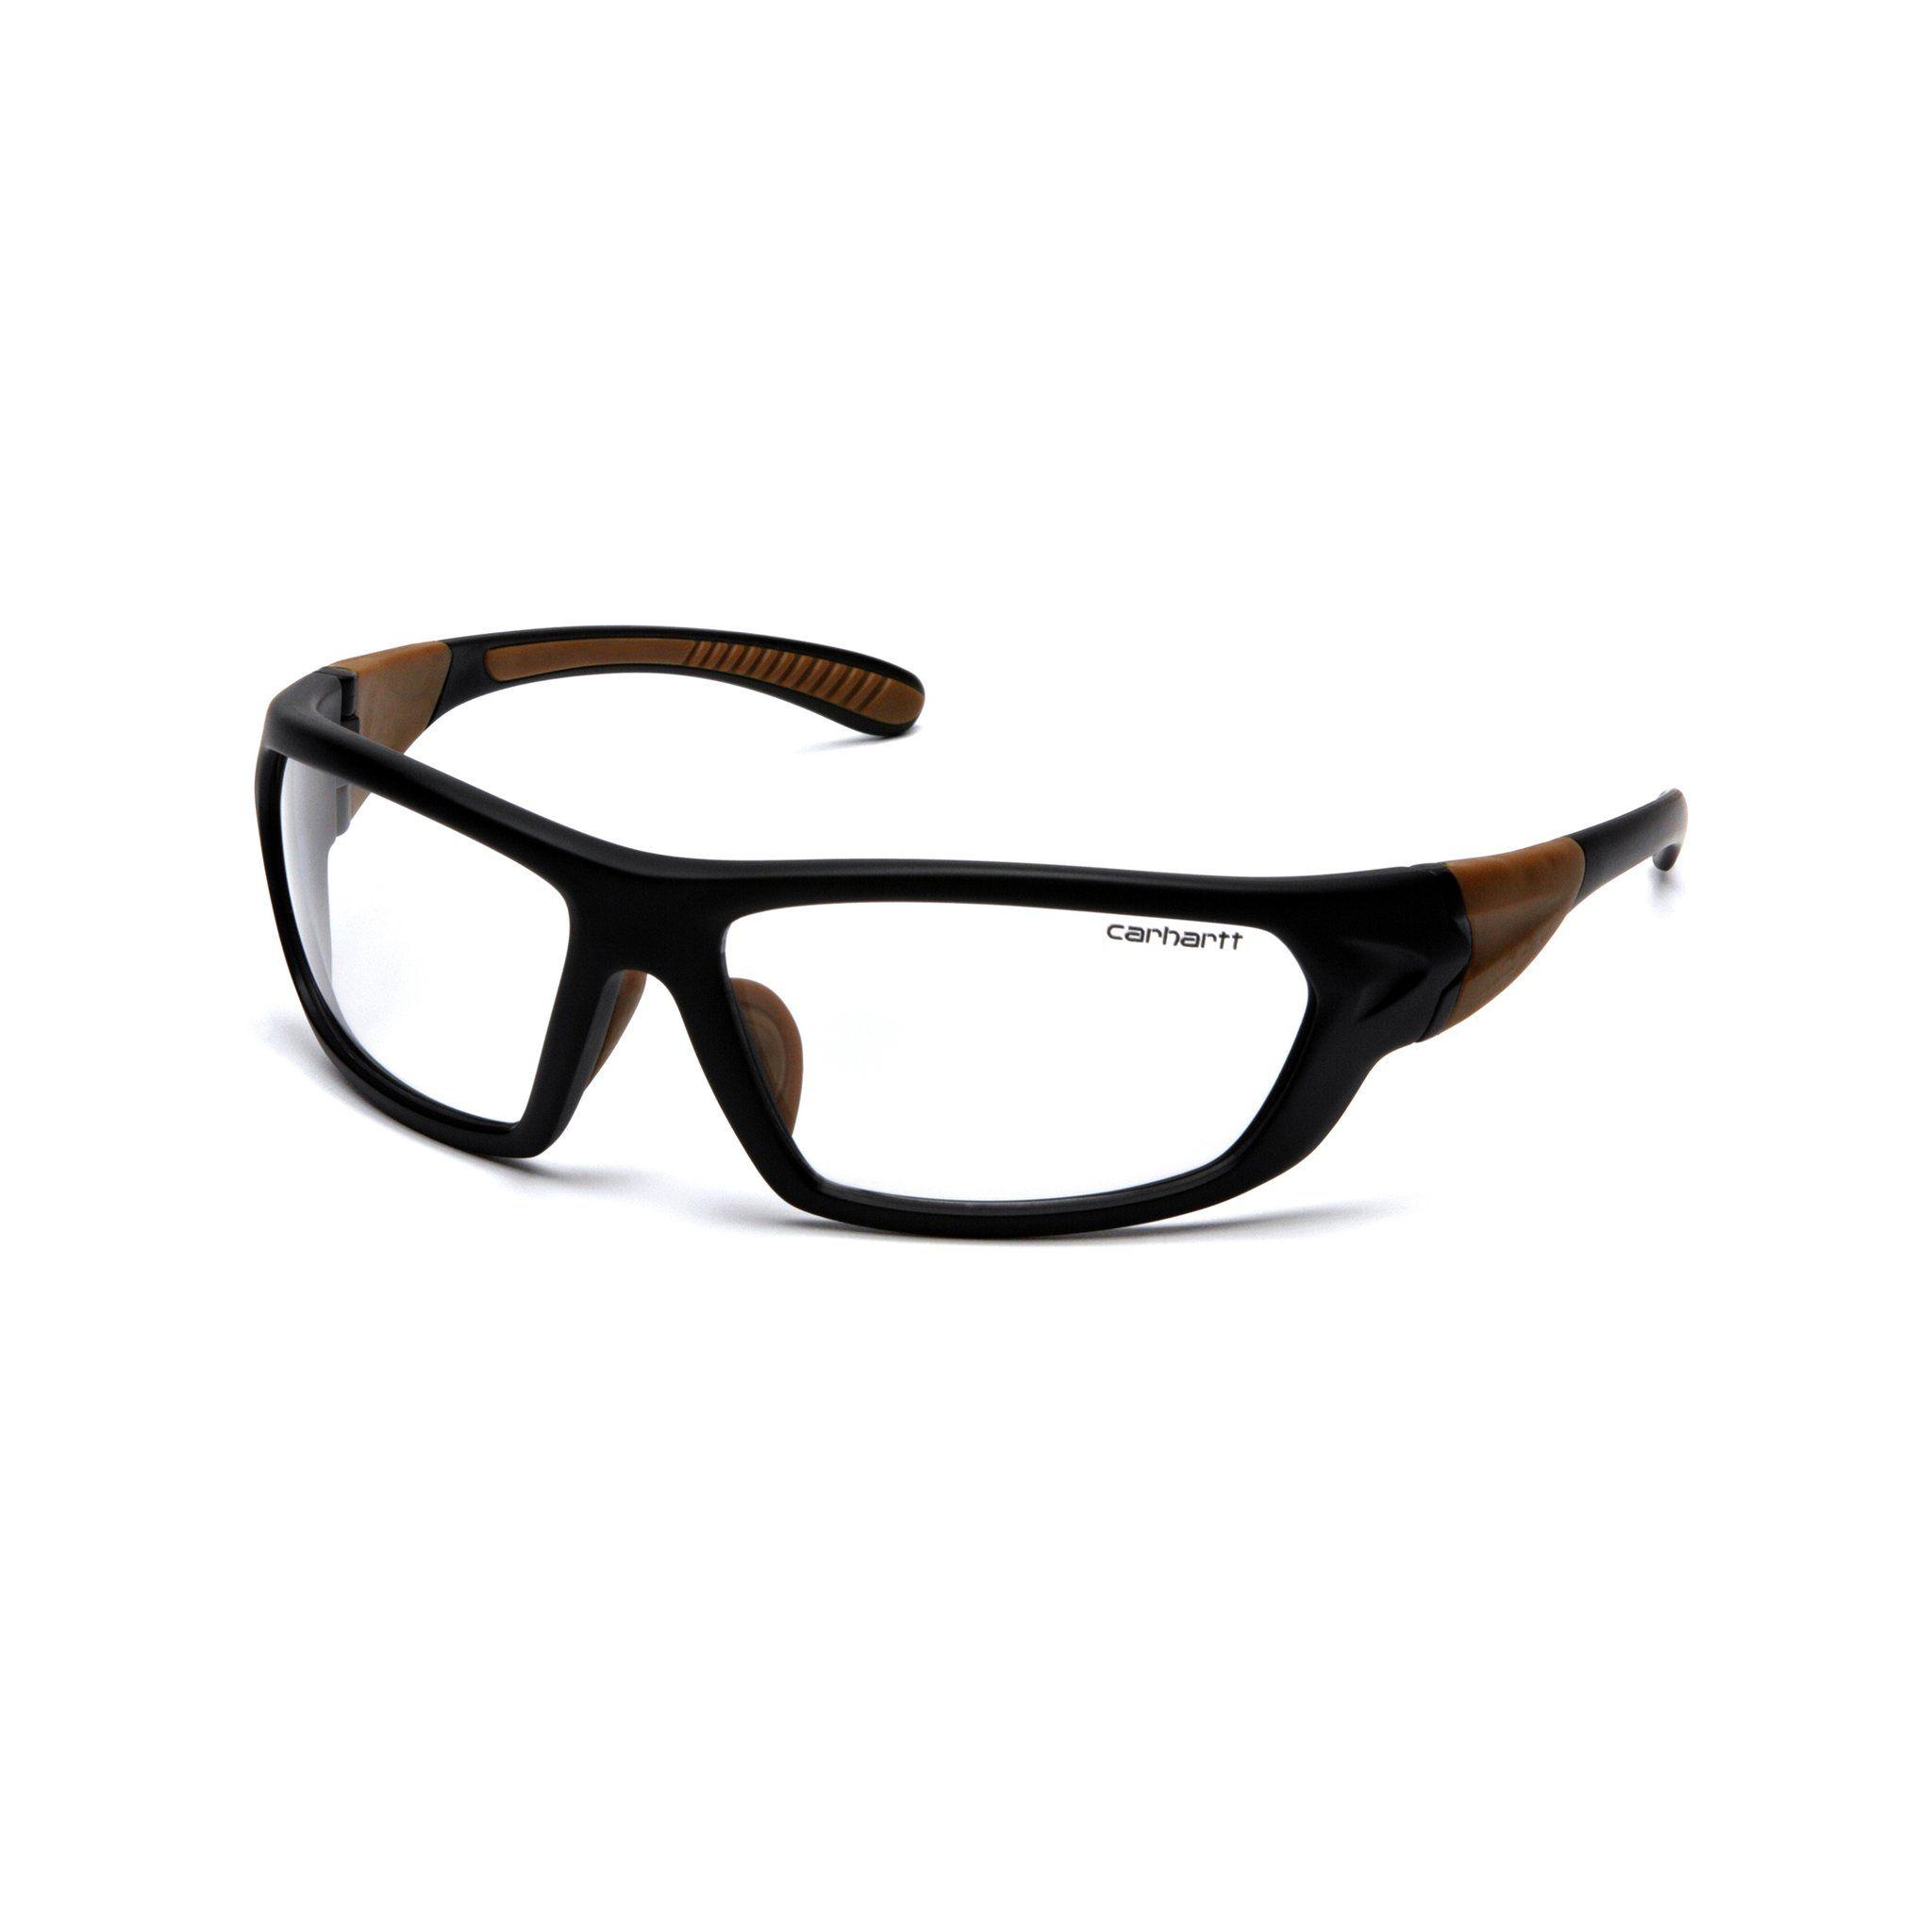 Carhartt carbondale antifog lens safety glasses pyramex